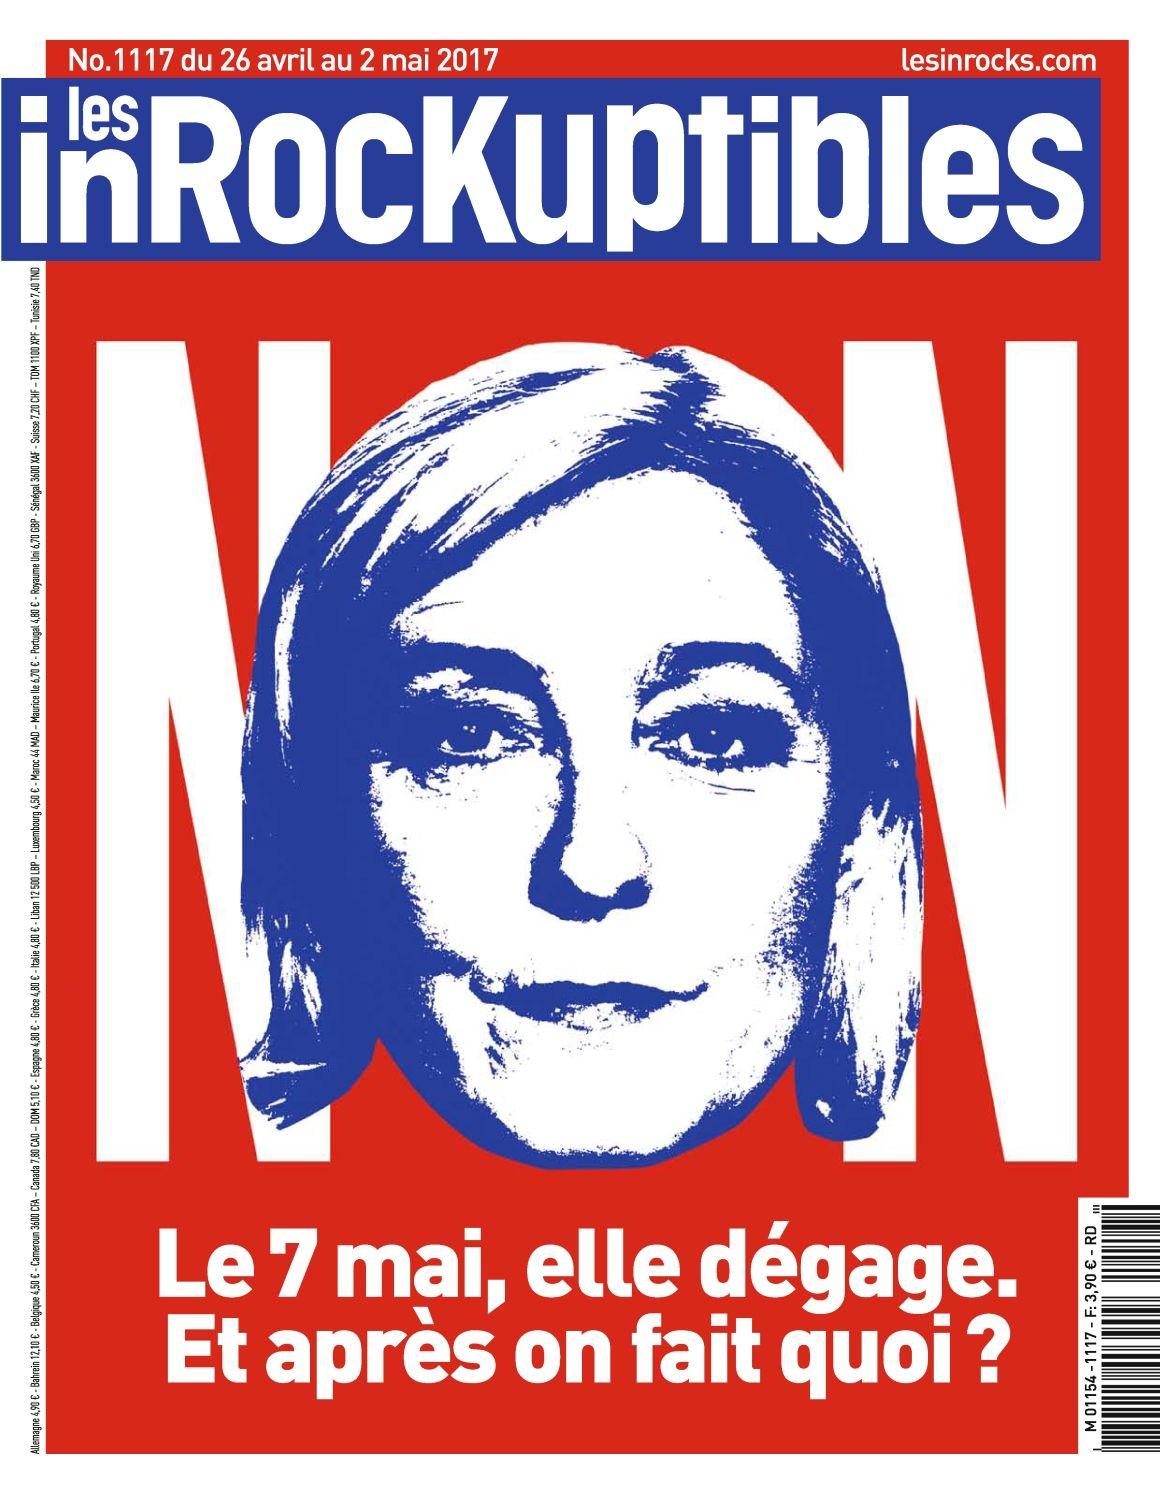 Les Inrockuptibles N° 1117 Mercredi 26 Avril 2017 26